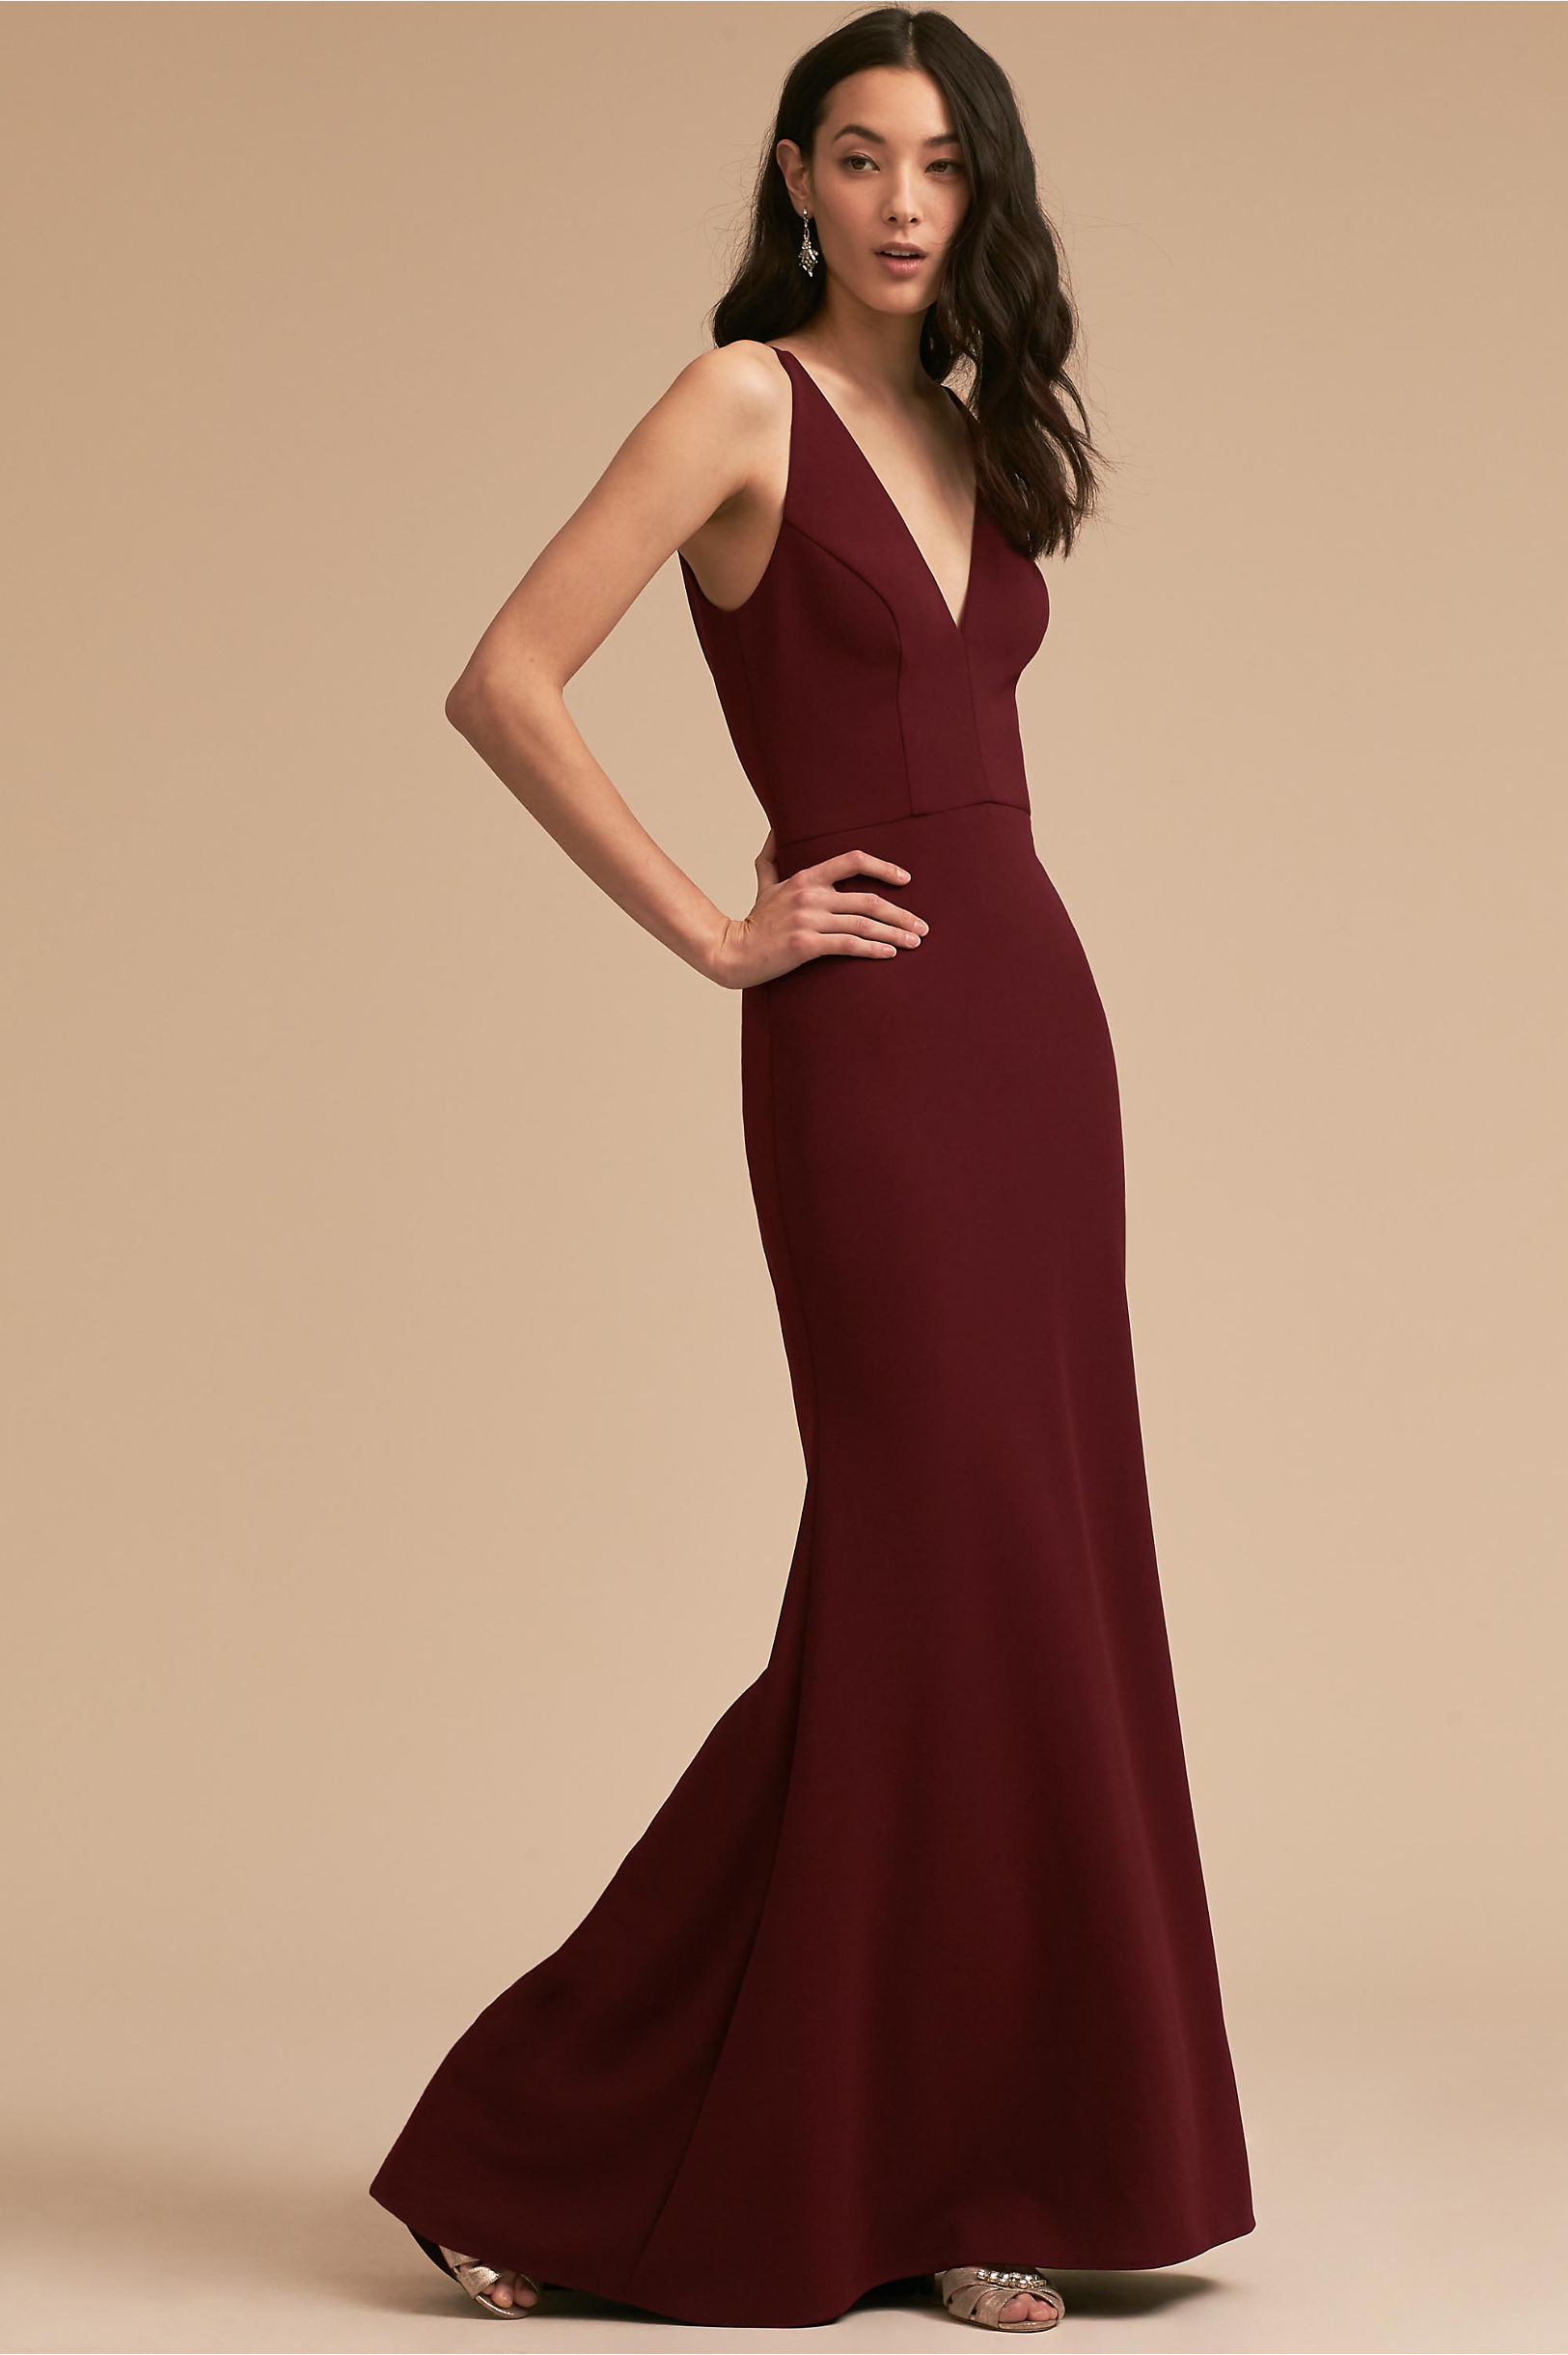 Long bridesmaid dresses gowns chiffon styles bhldn jones dress ombrellifo Images